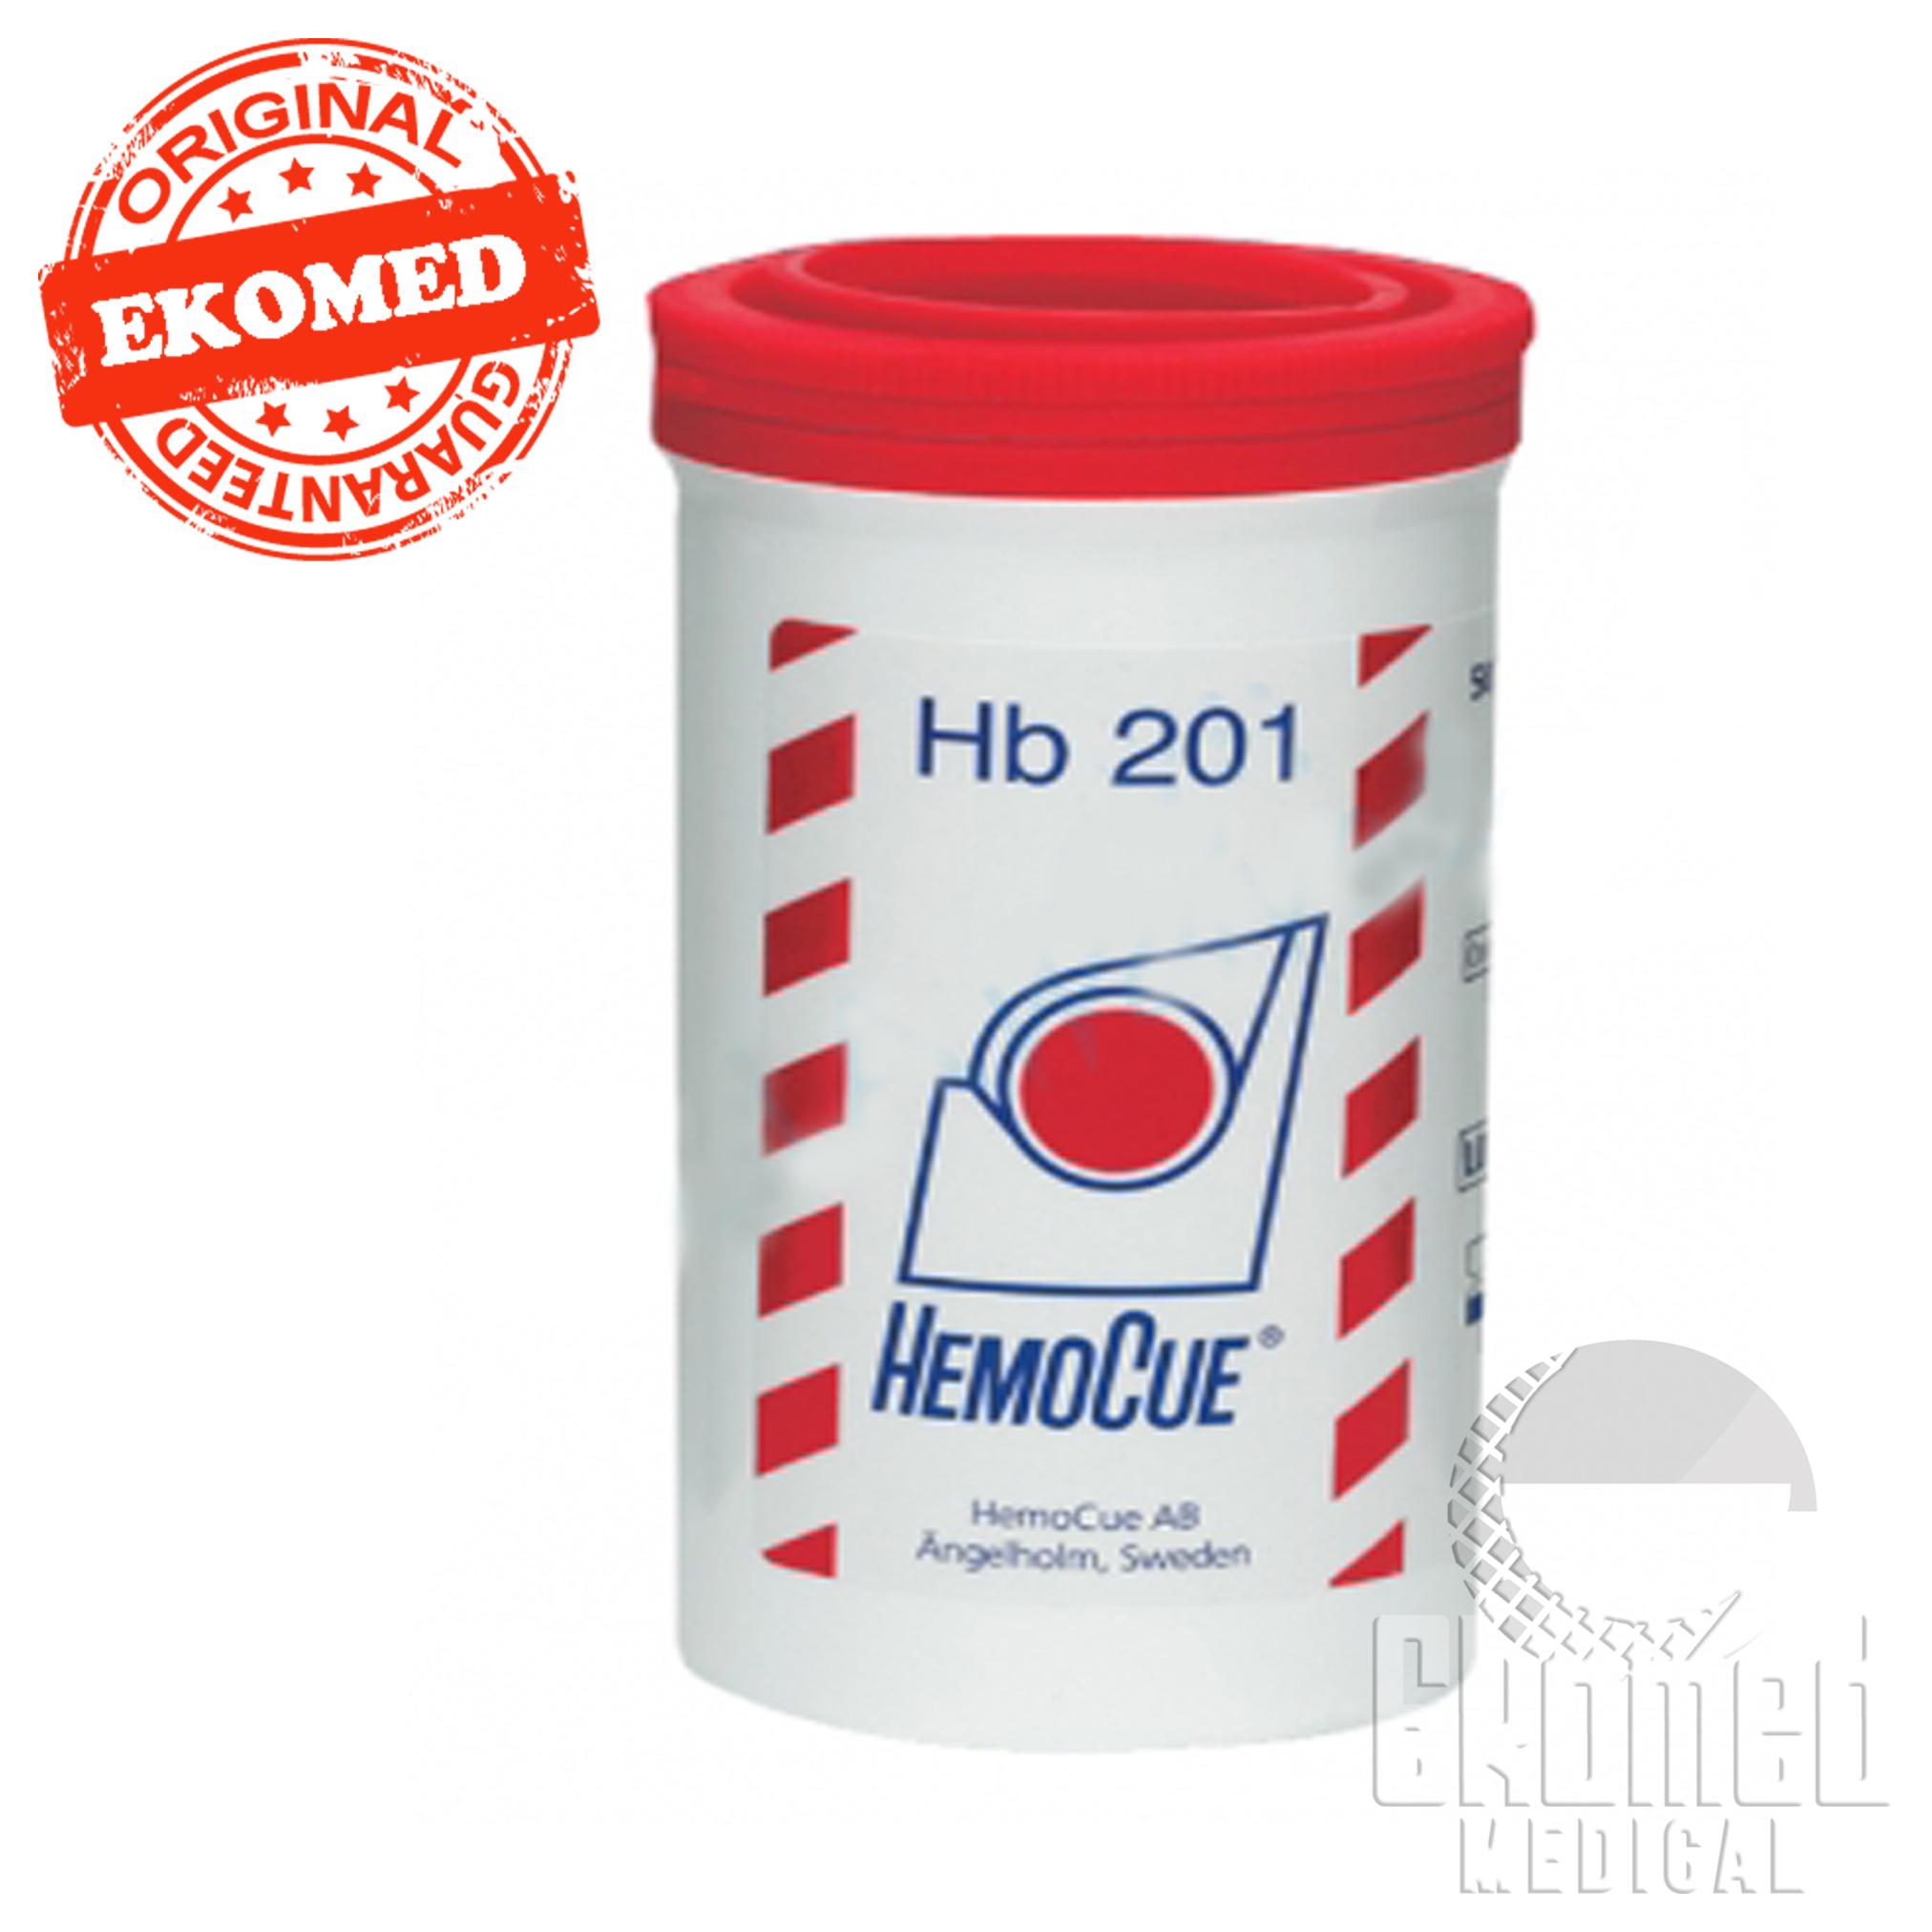 Hemocue Hb 201 Hemoglobin Strip 4x50 Microcuvettes Ekomed